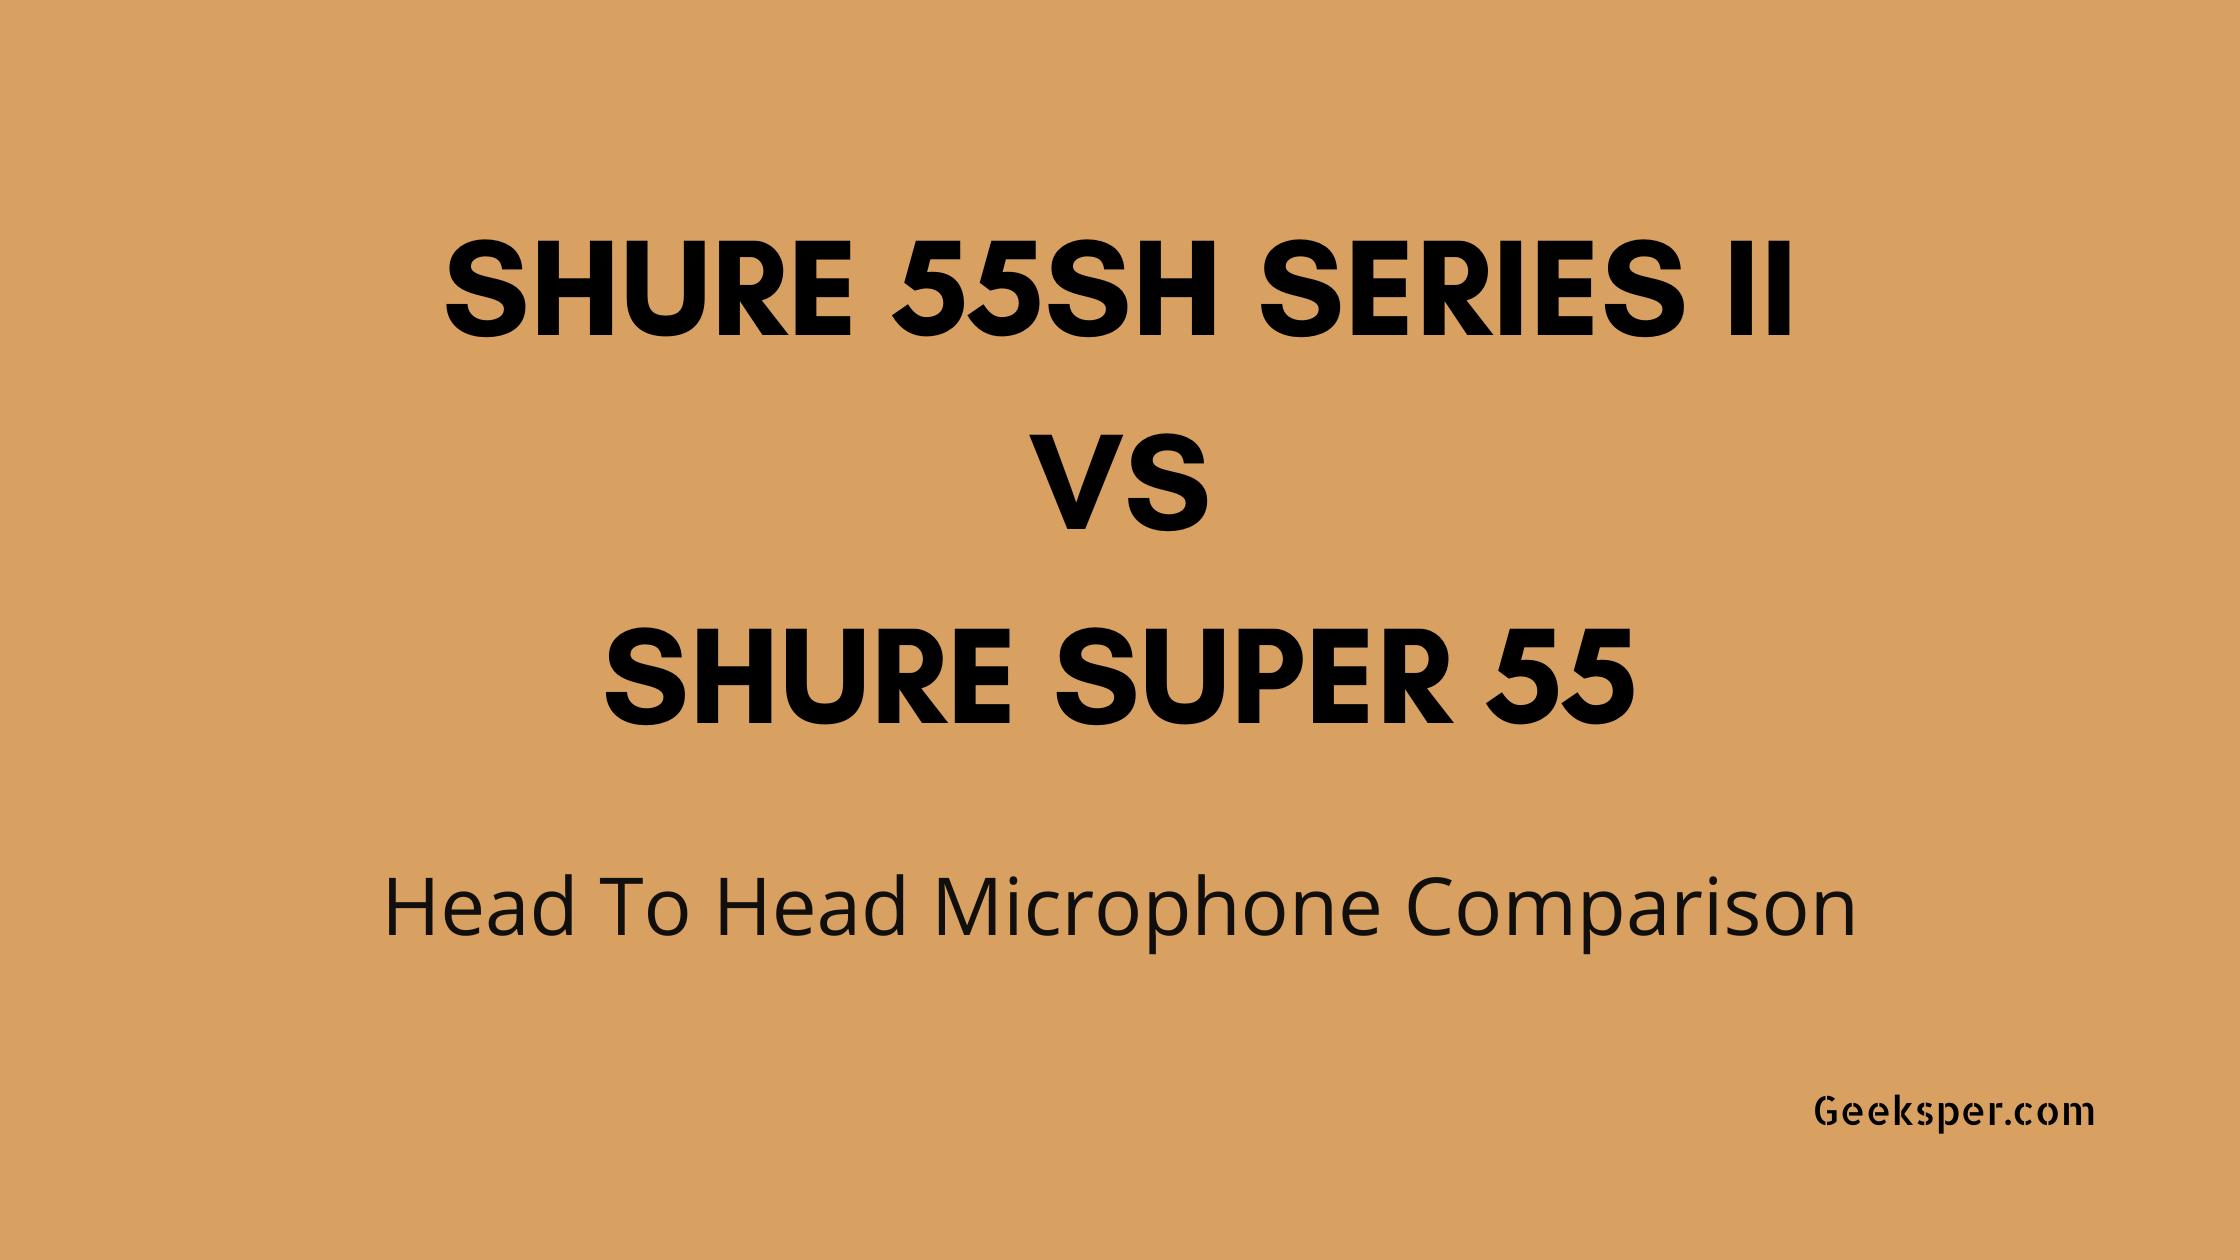 Shure 55SH vs Shure Super 55 Microphone